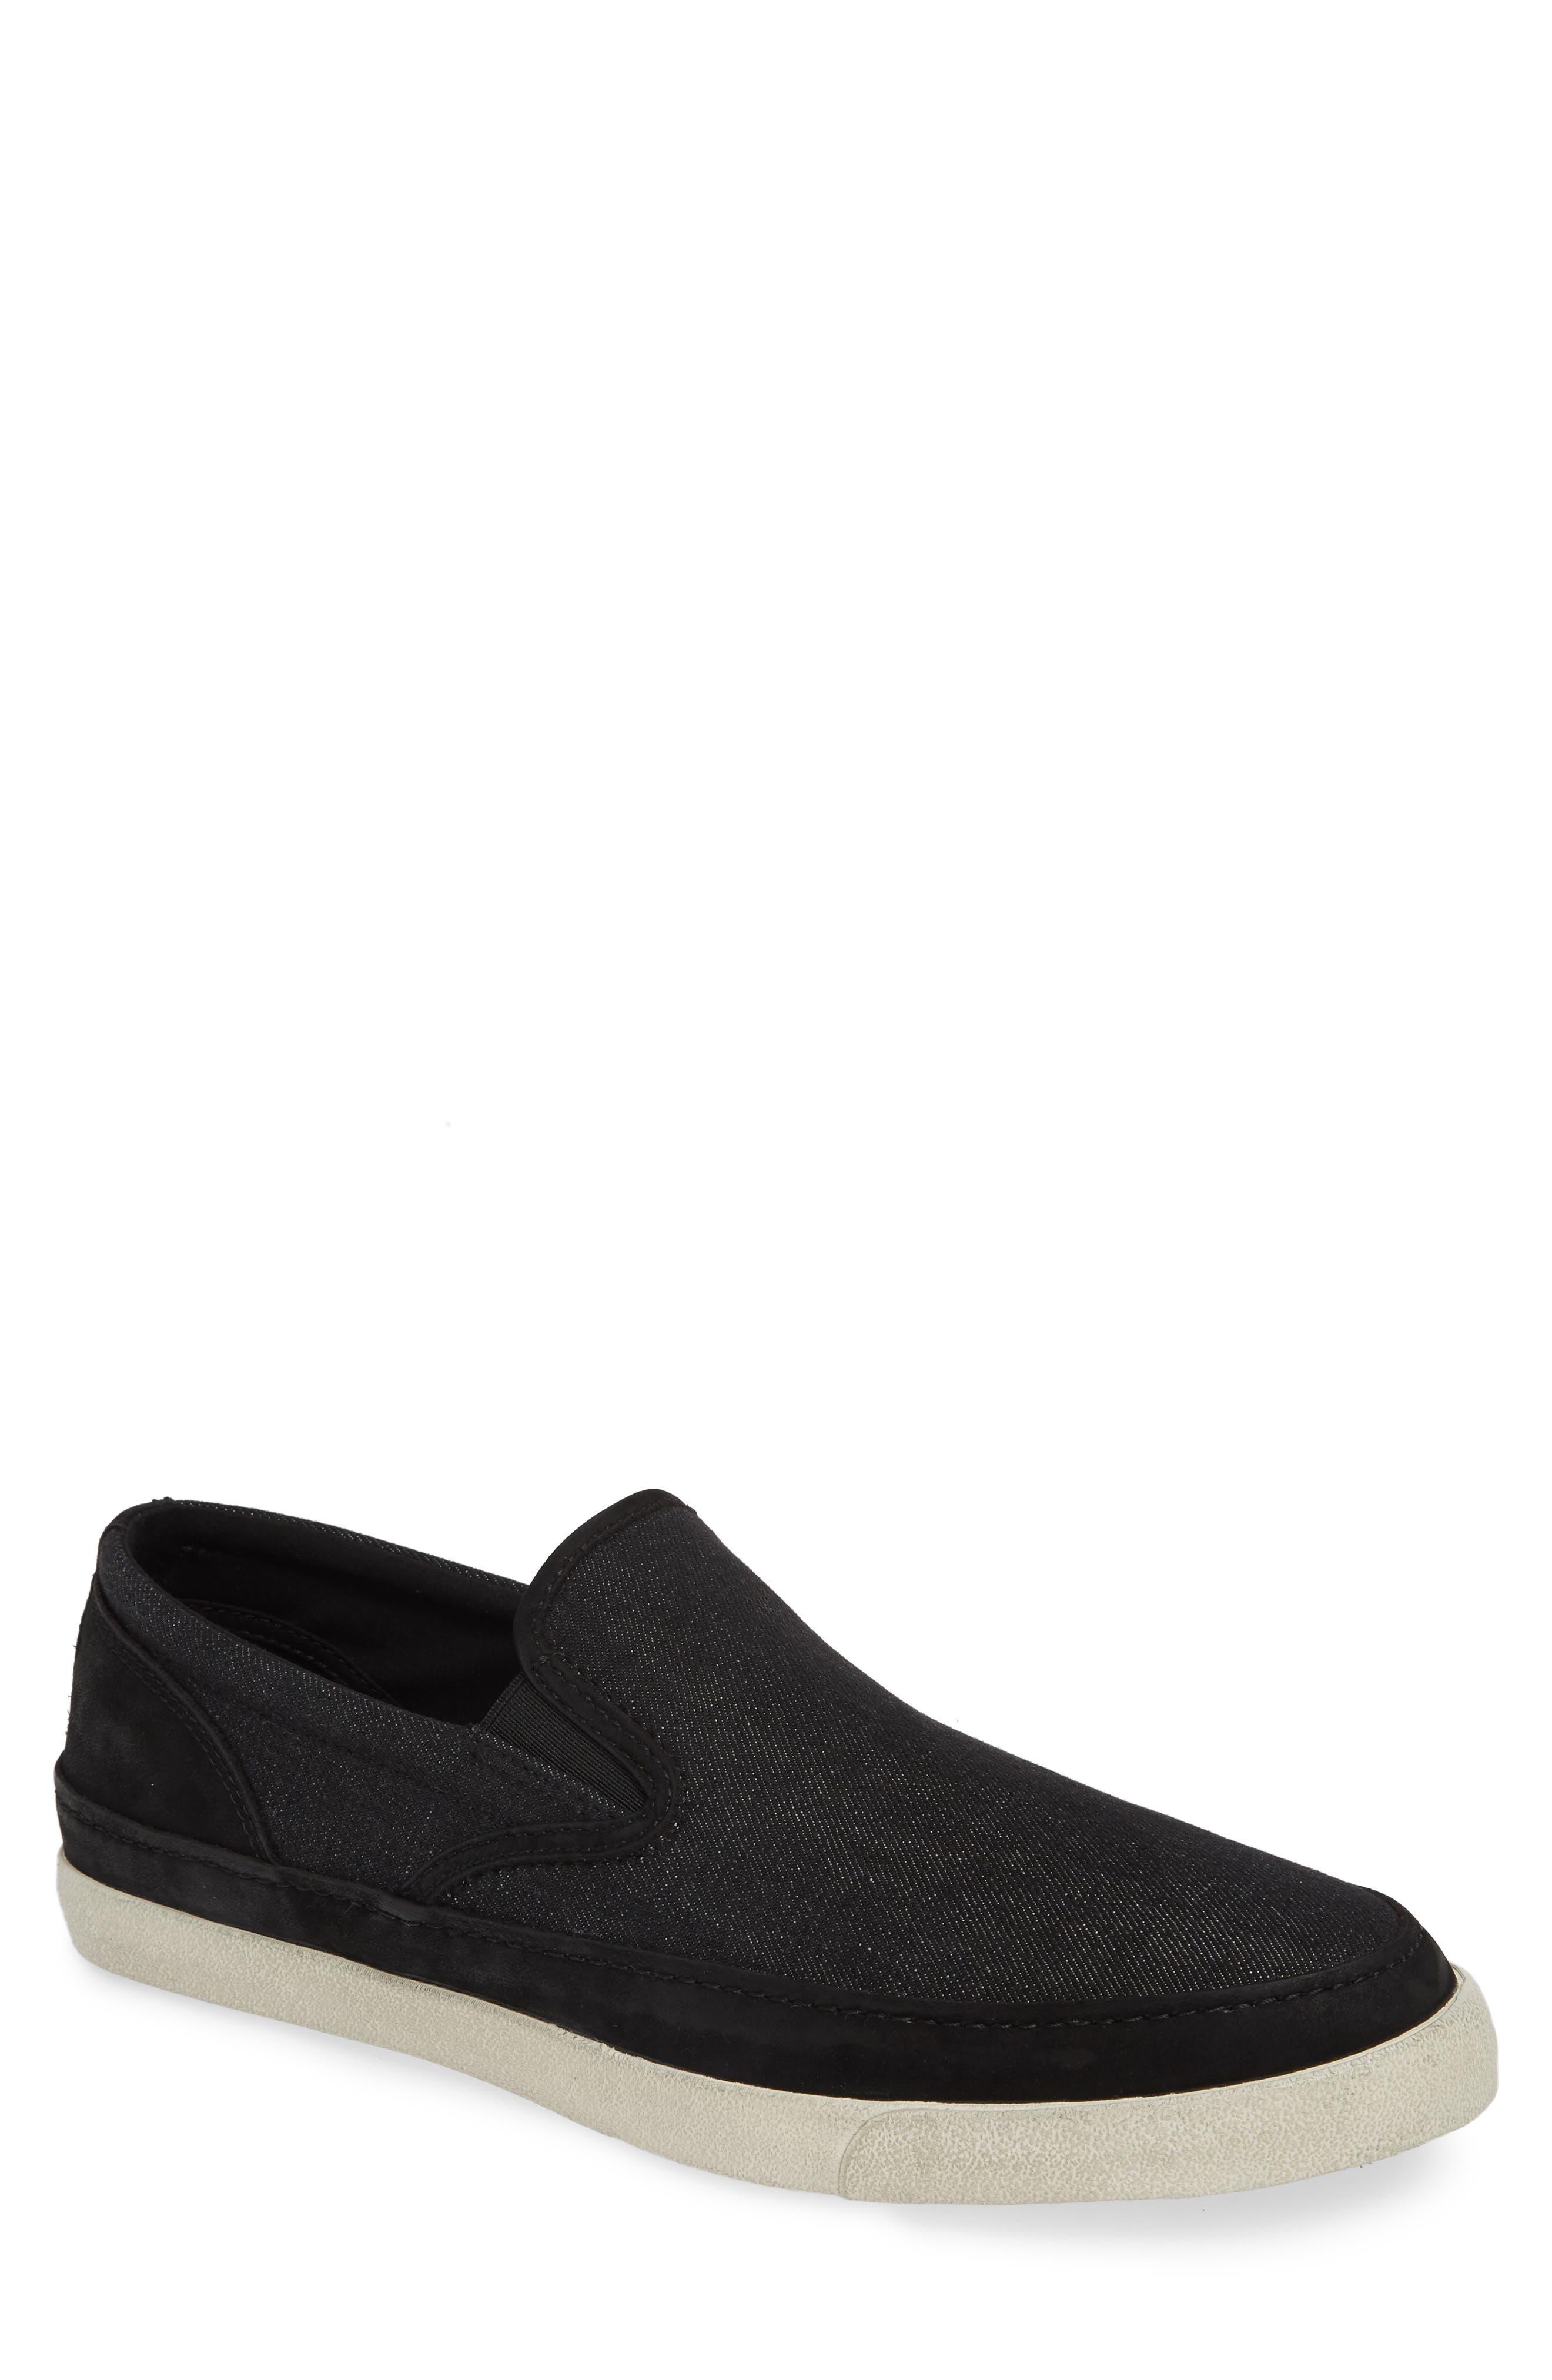 Jet Canvas Slip-On Sneaker, Main, color, MINERAL BLK